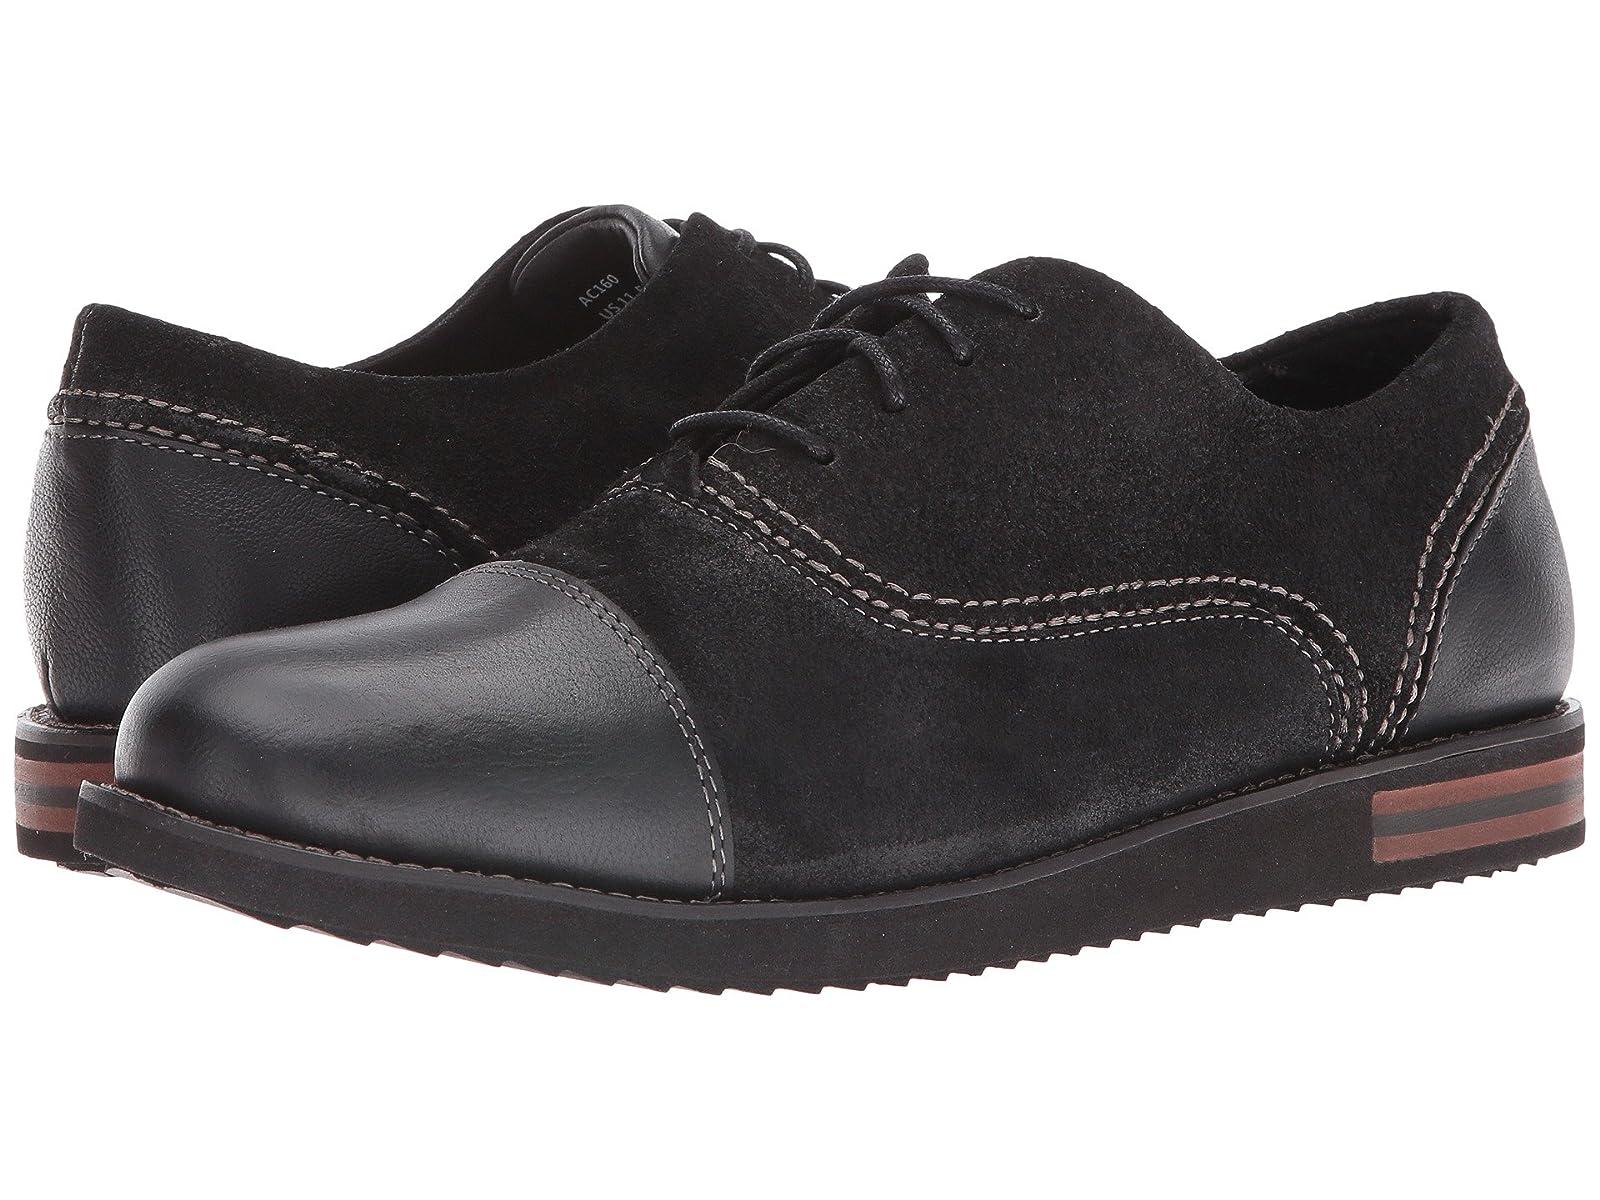 Aetrex JadenAtmospheric grades have affordable shoes